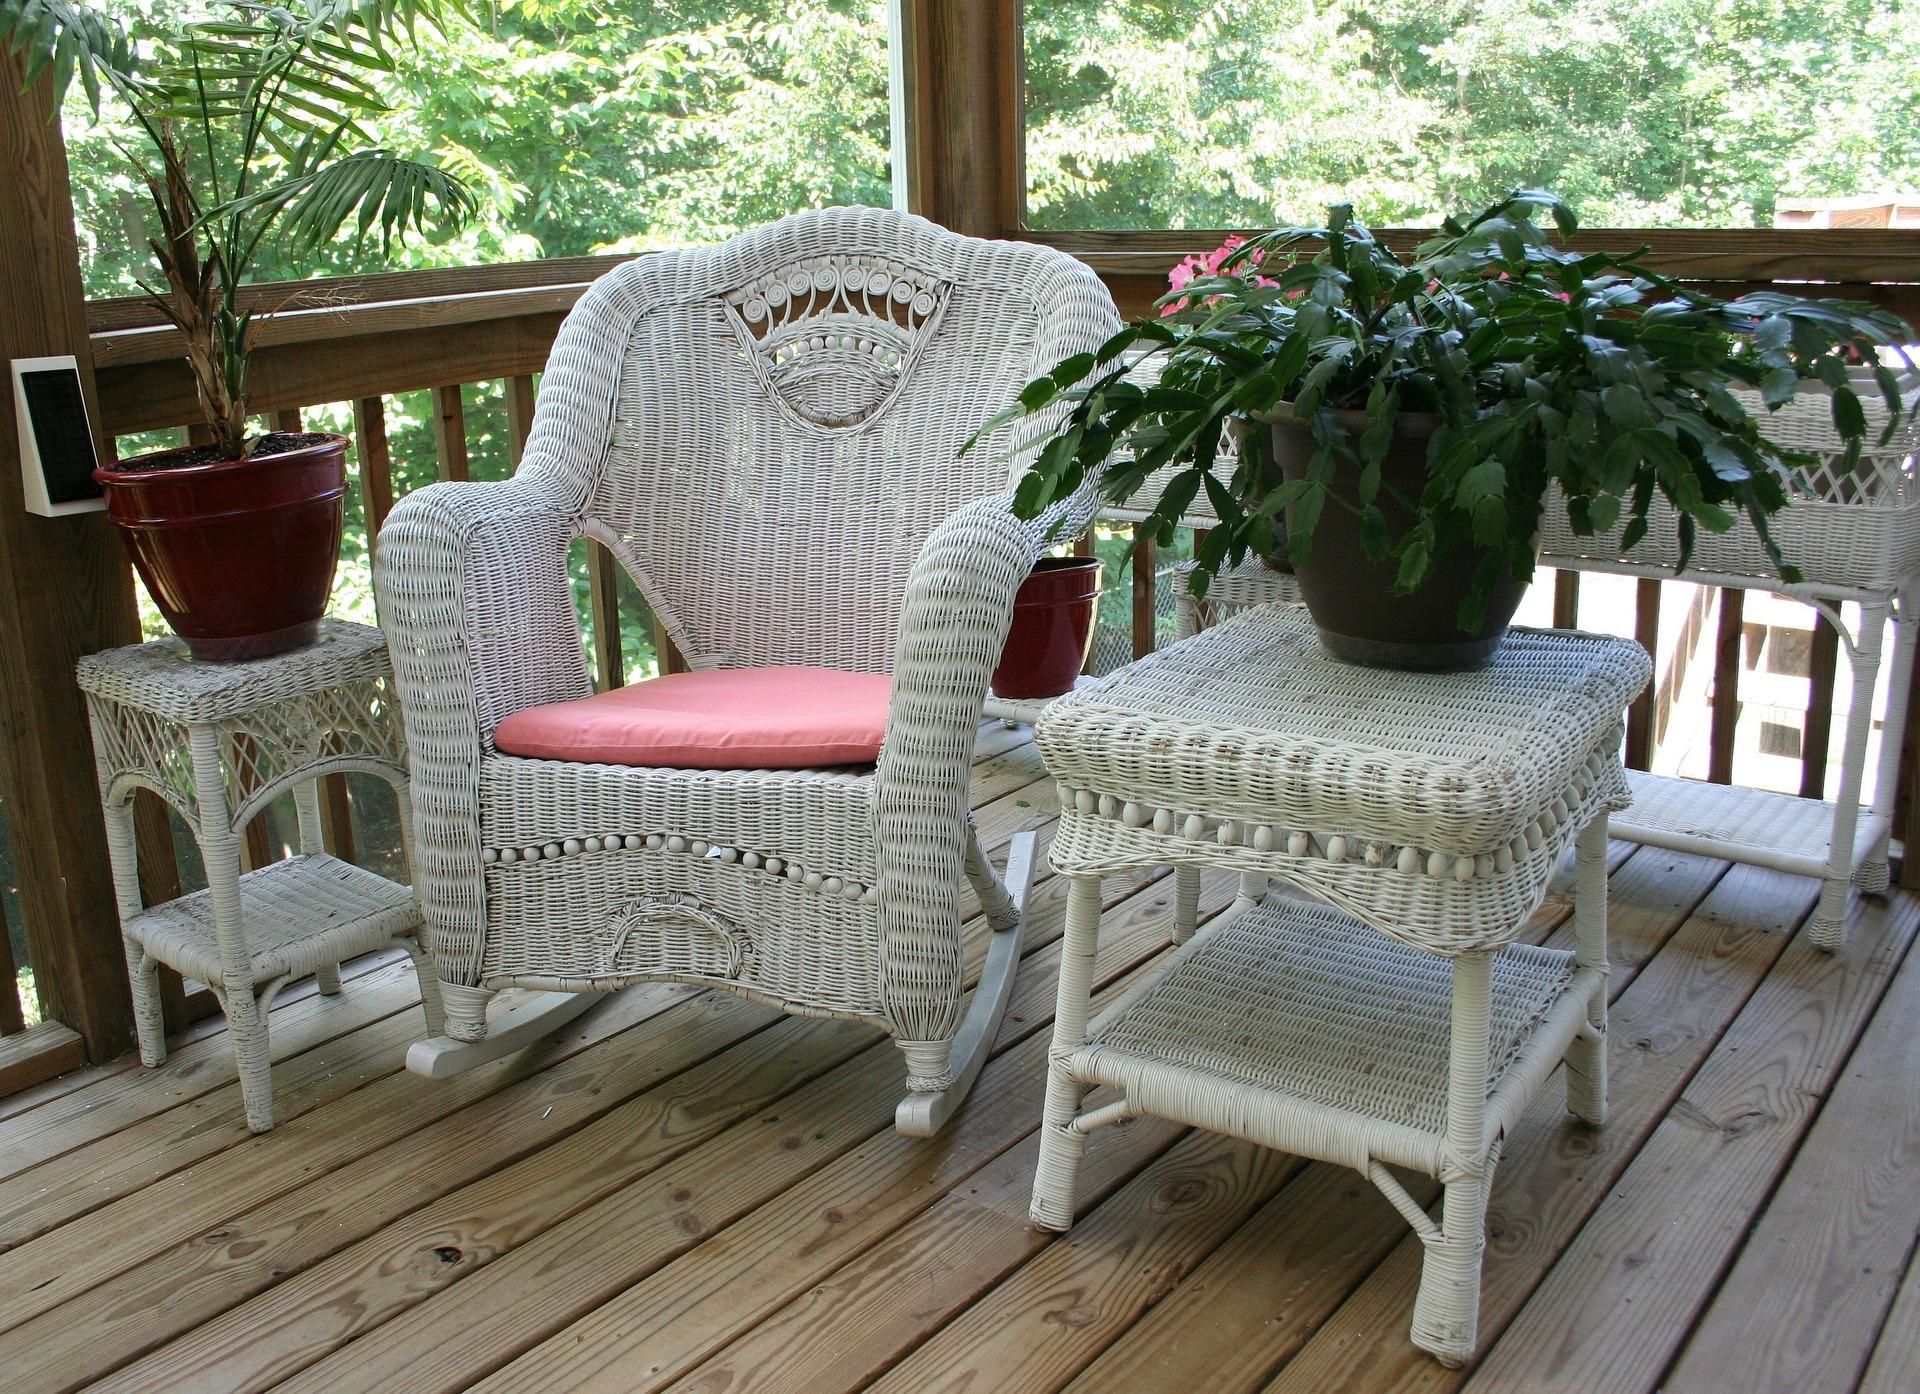 wicker-rocking-chair-50613_1920